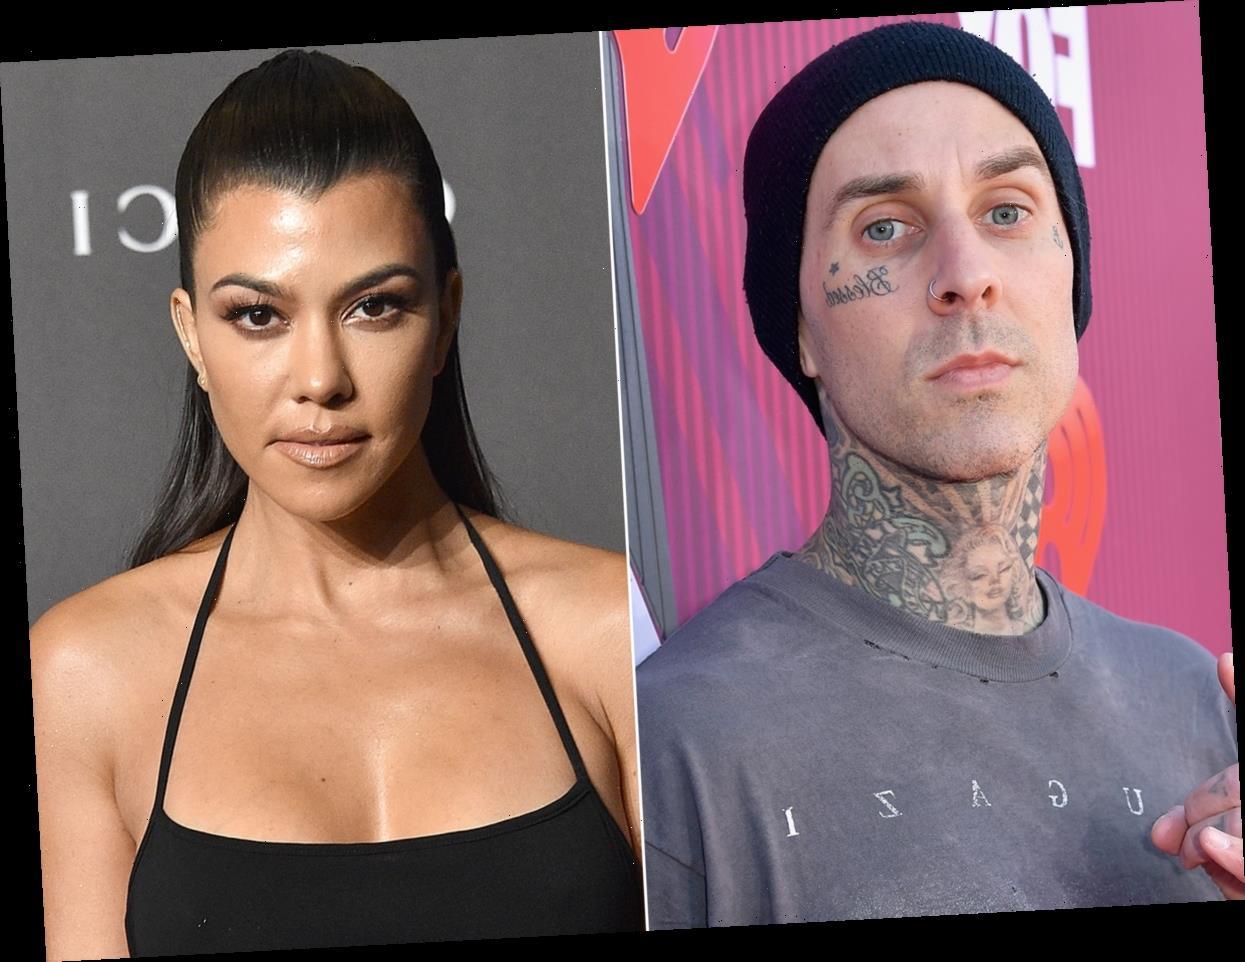 Kourtney Kardashian and Travis Barker Celebrate Their First Valentine's Day Together